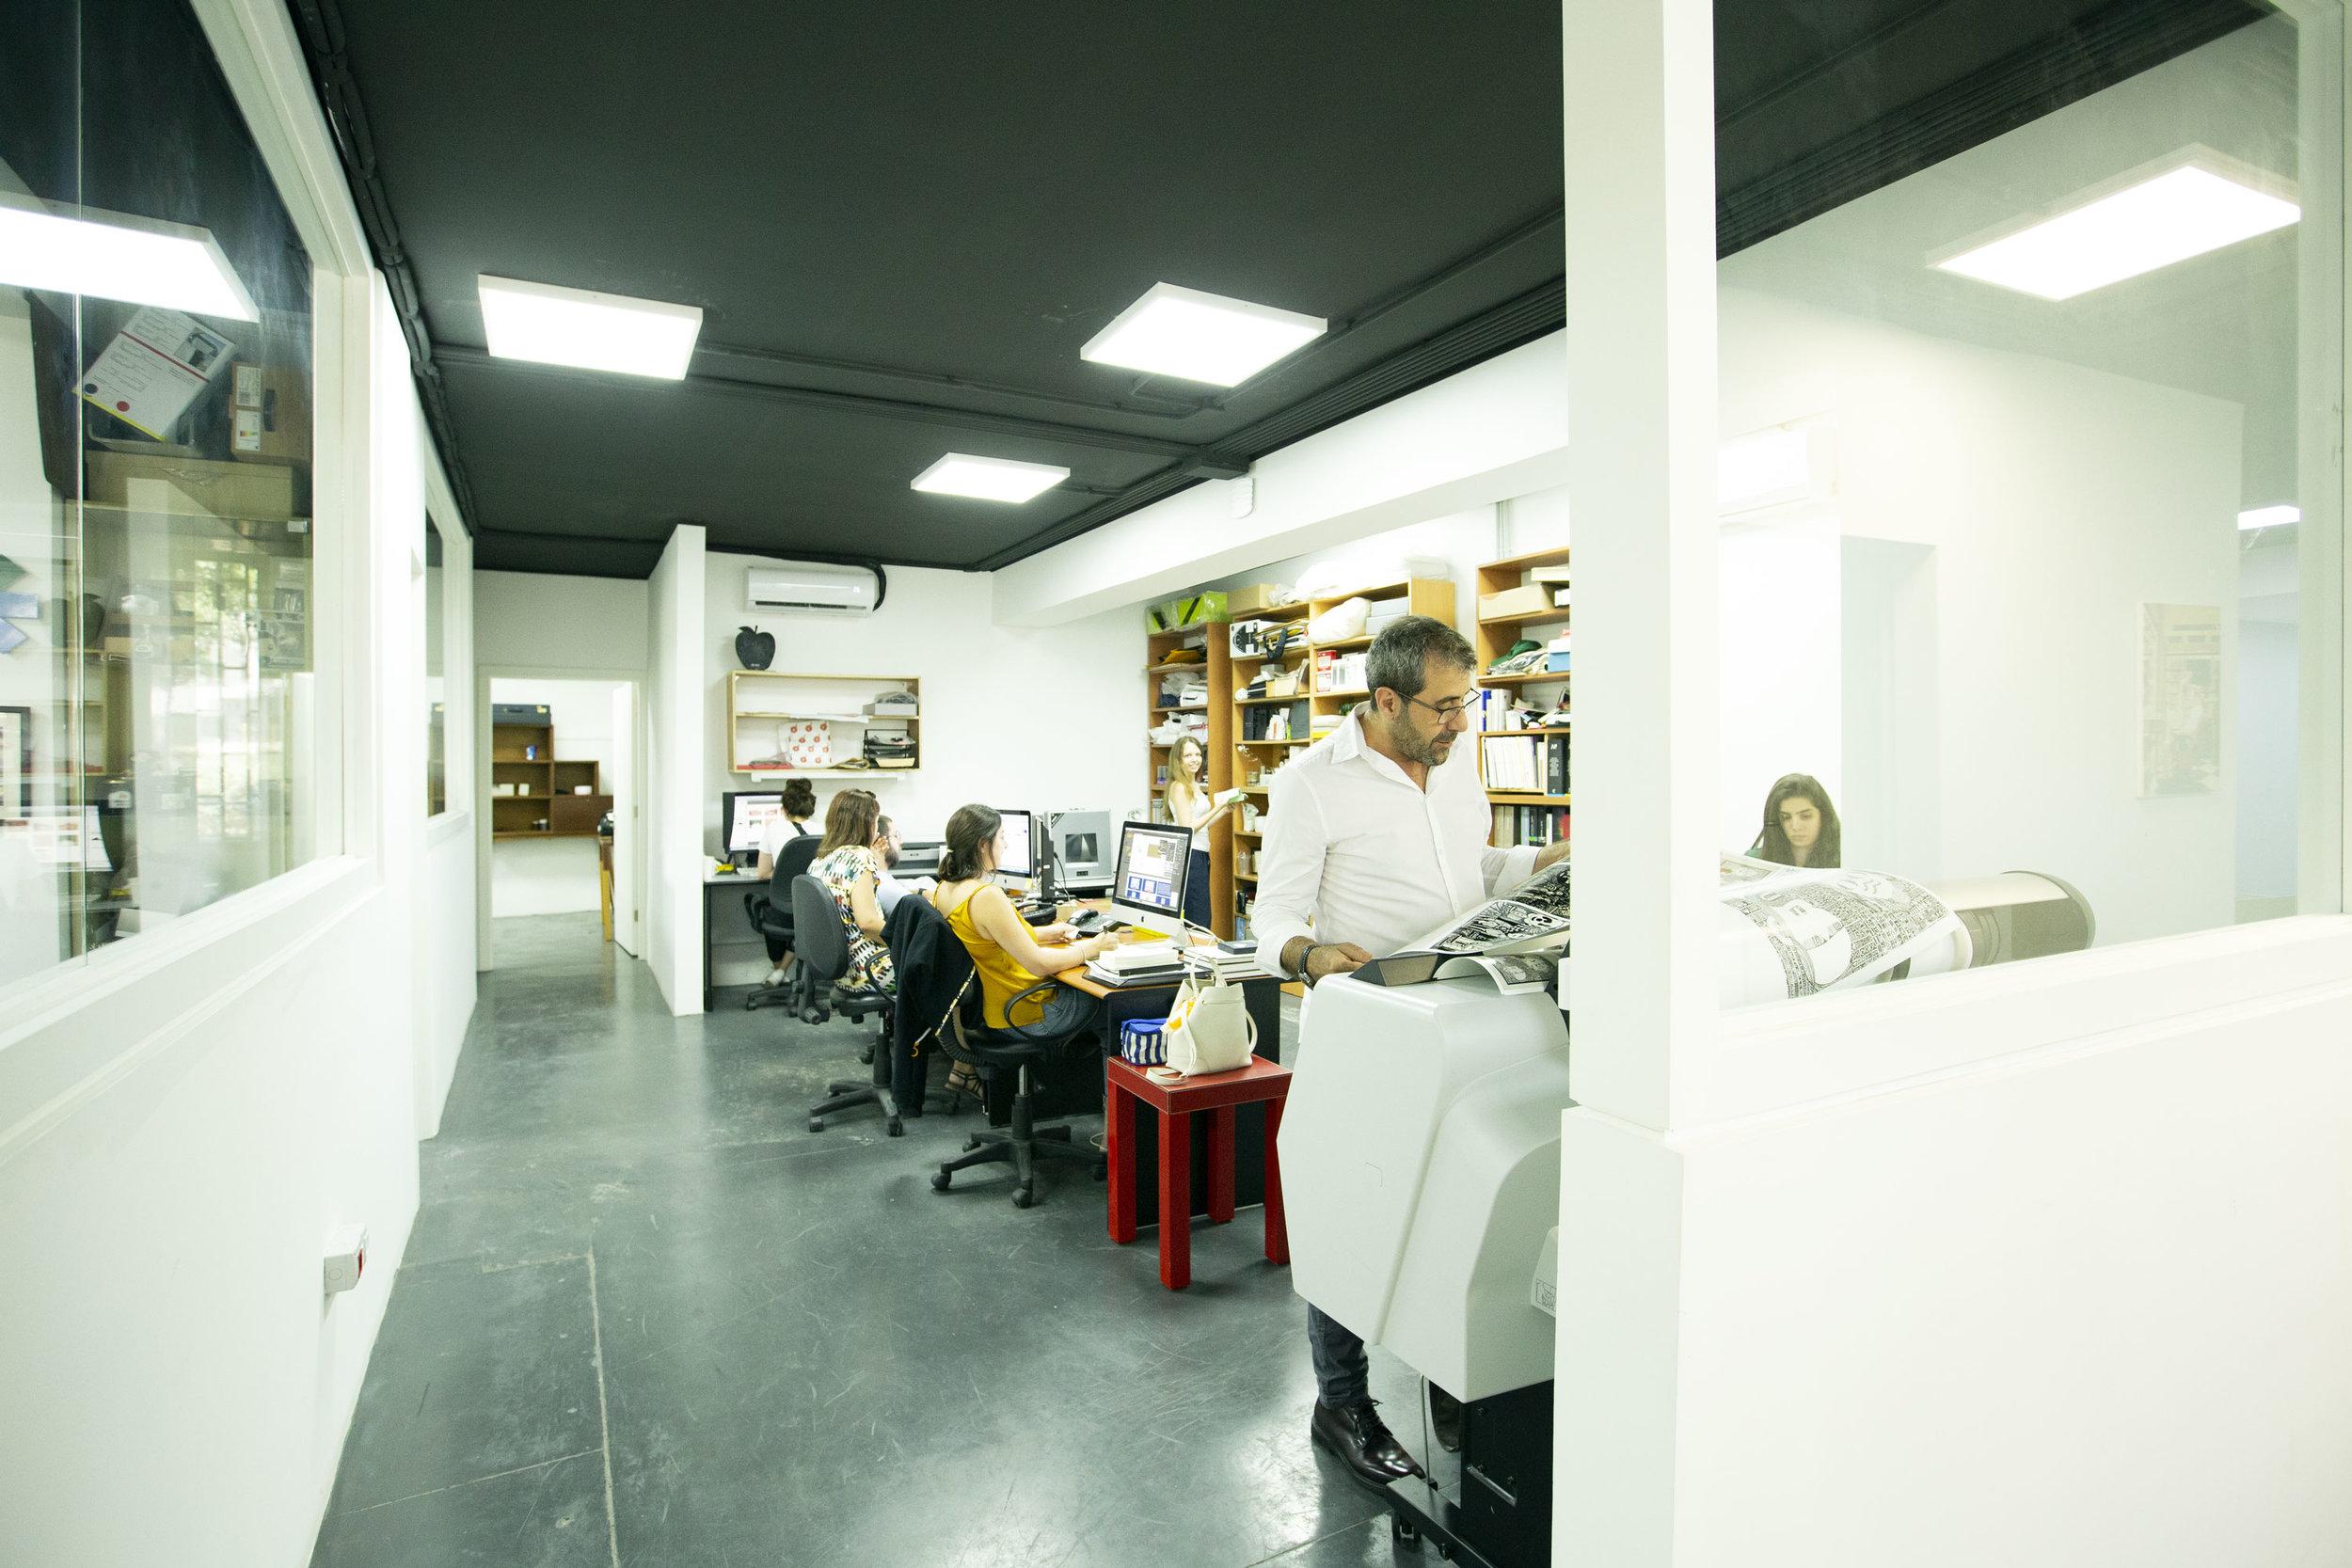 -scope Ateliers's creative team